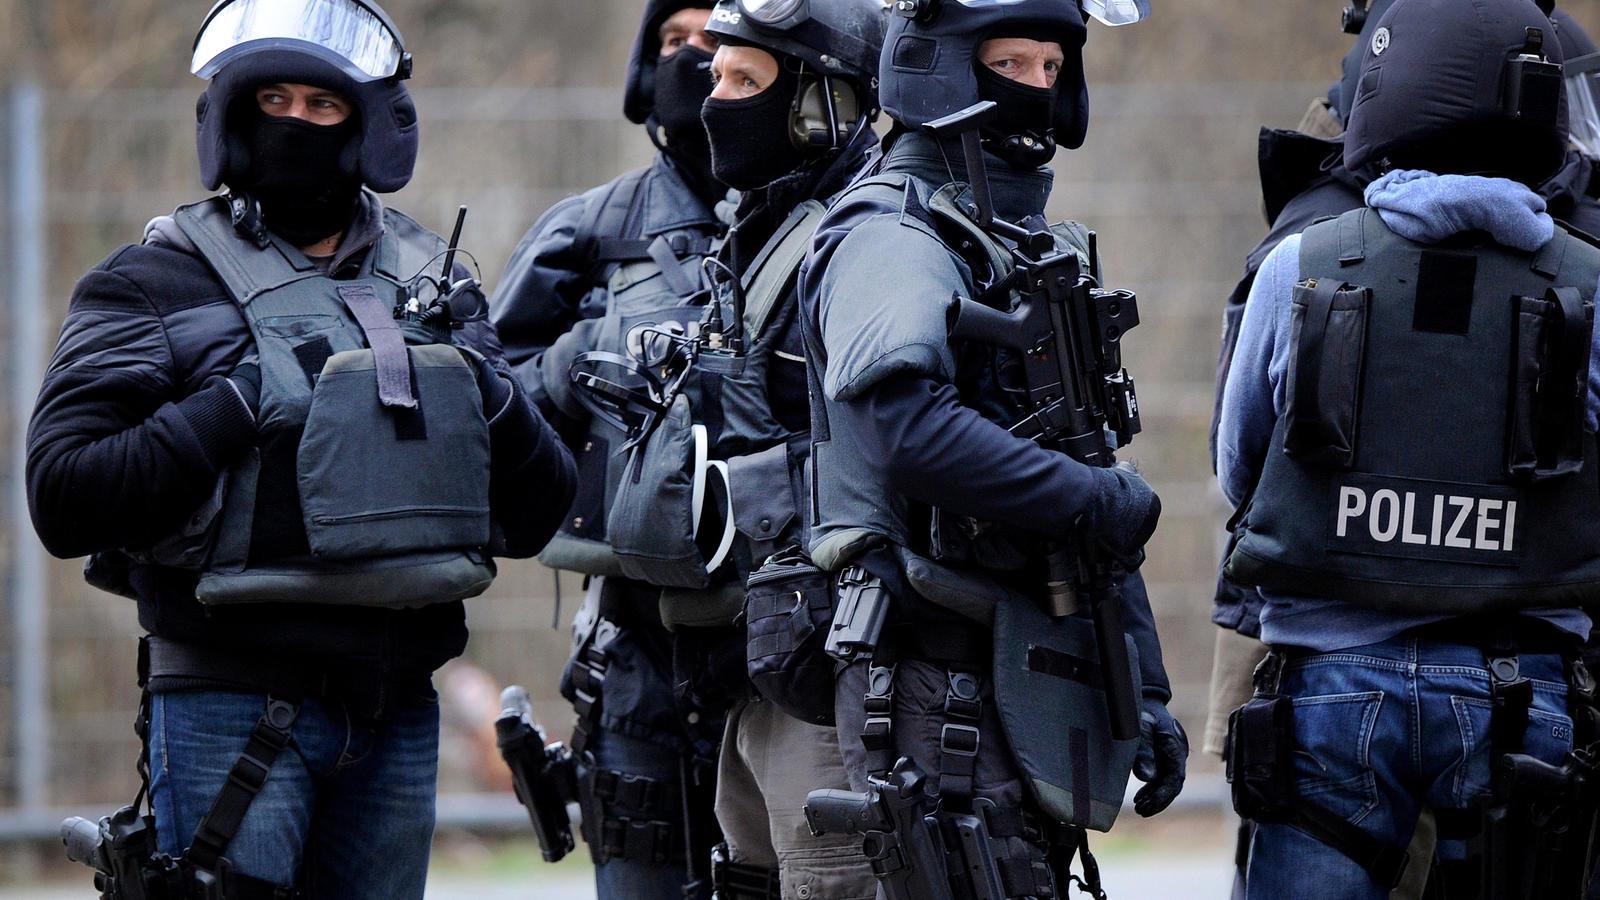 Polizeieinsatz Festnahme wegen Terrorverdachts. Foto: Symbolbild